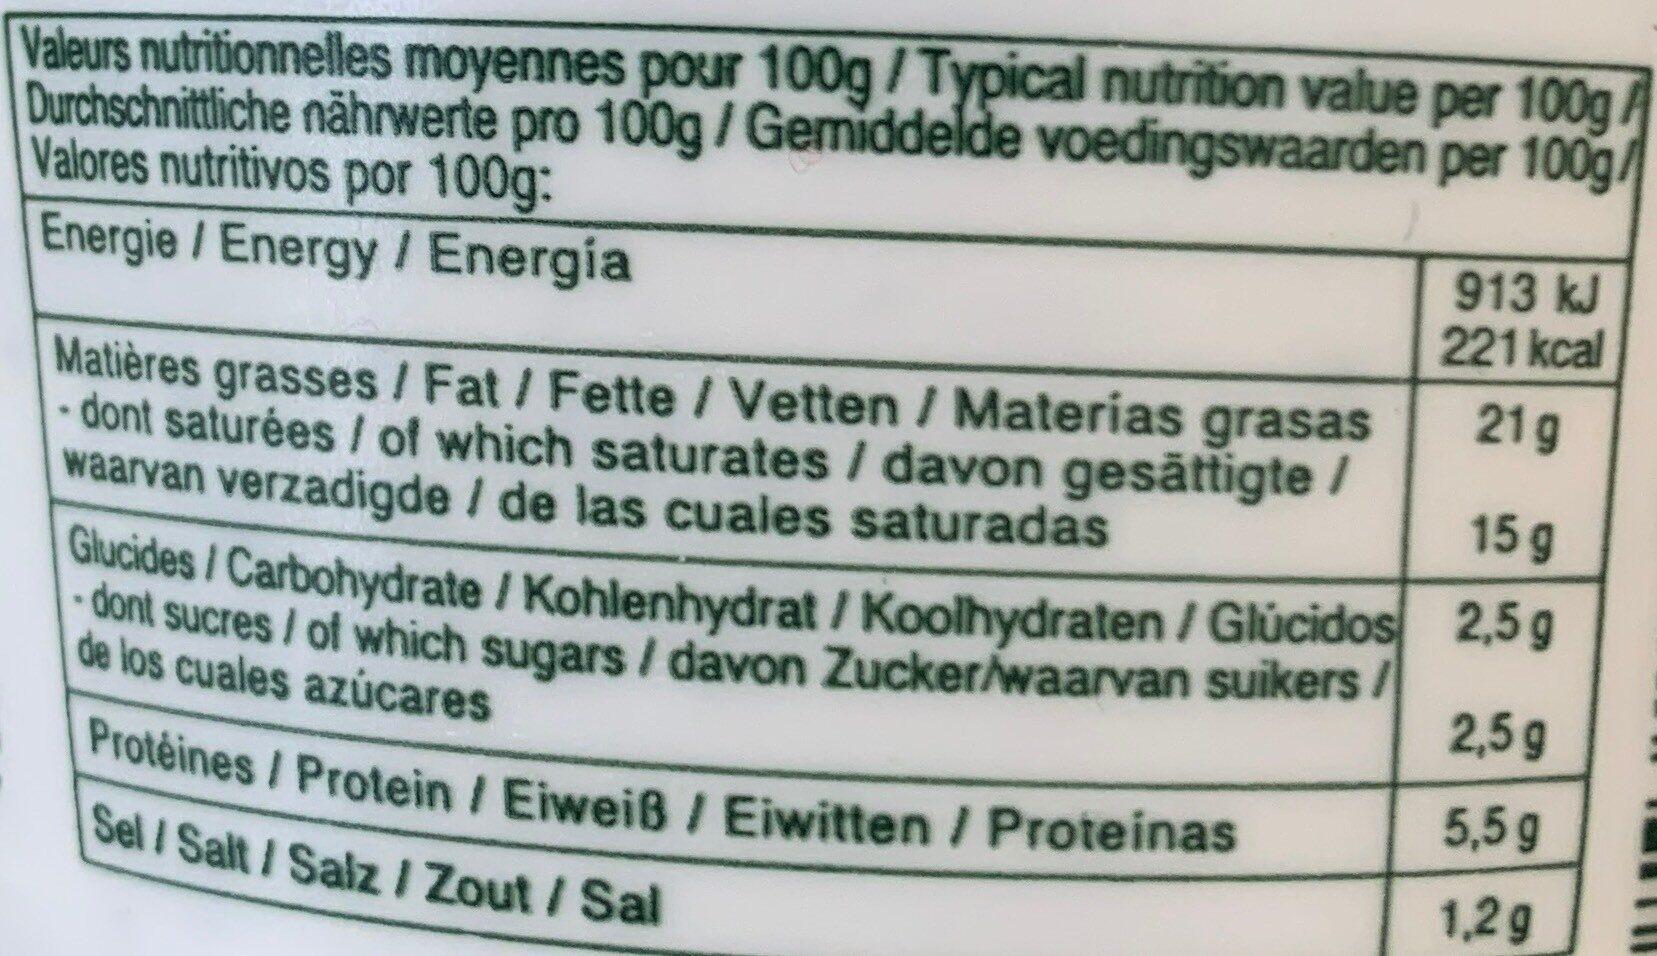 Fromage Ail et Fines Herbes - Informations nutritionnelles - fr